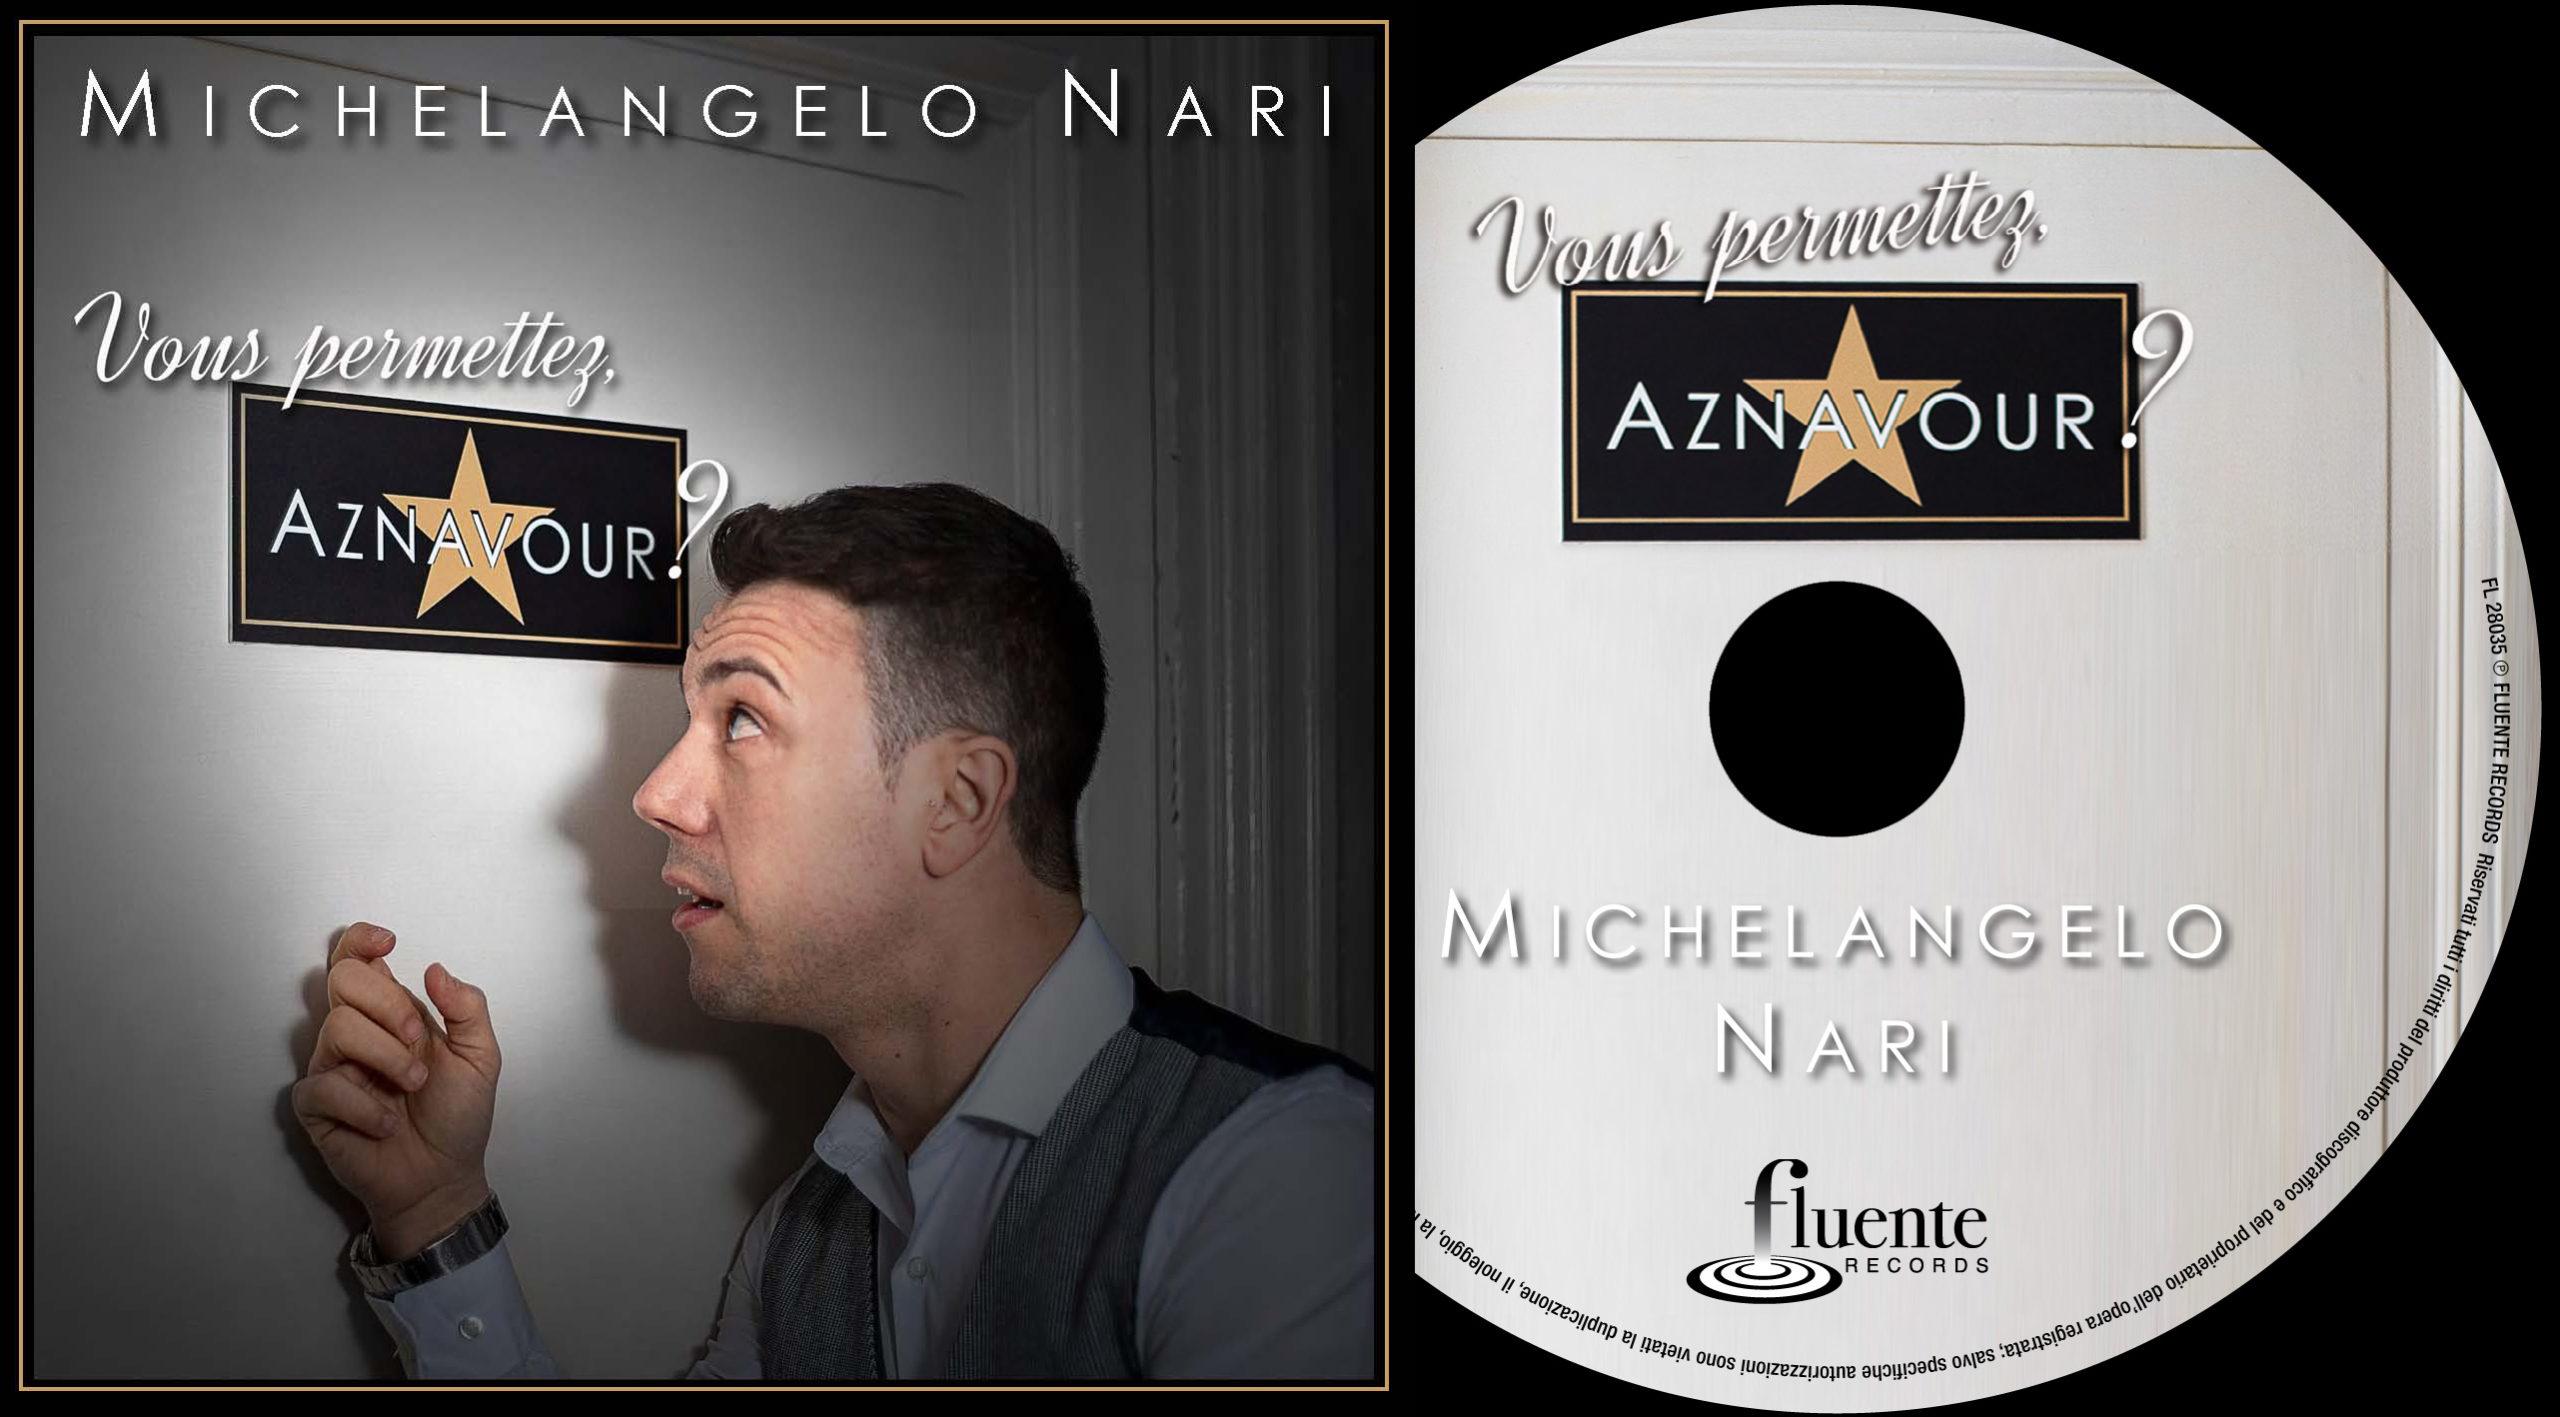 "Michelangelo Nari - ""Vous permettez, Aznavour?"" - Cover and CD"